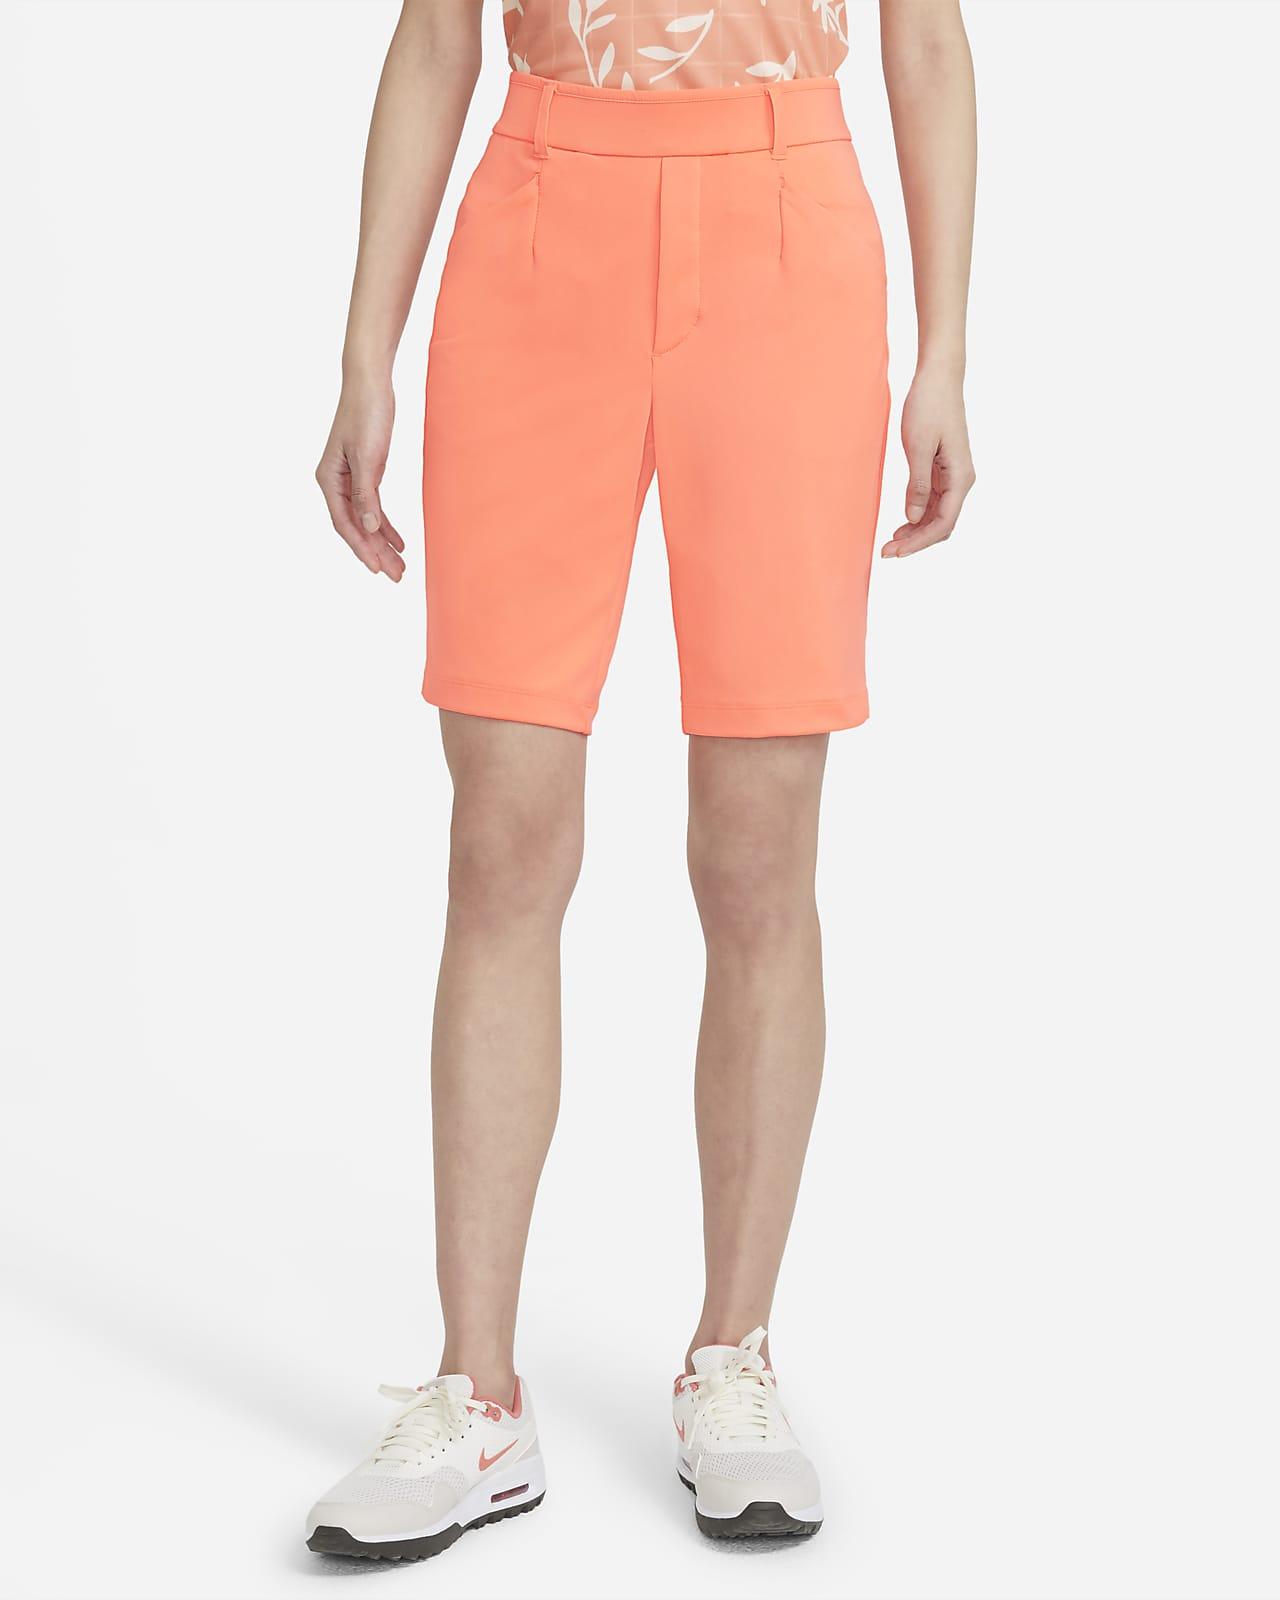 Shorts de golf para mujer Nike Dri-FIT UV Ace